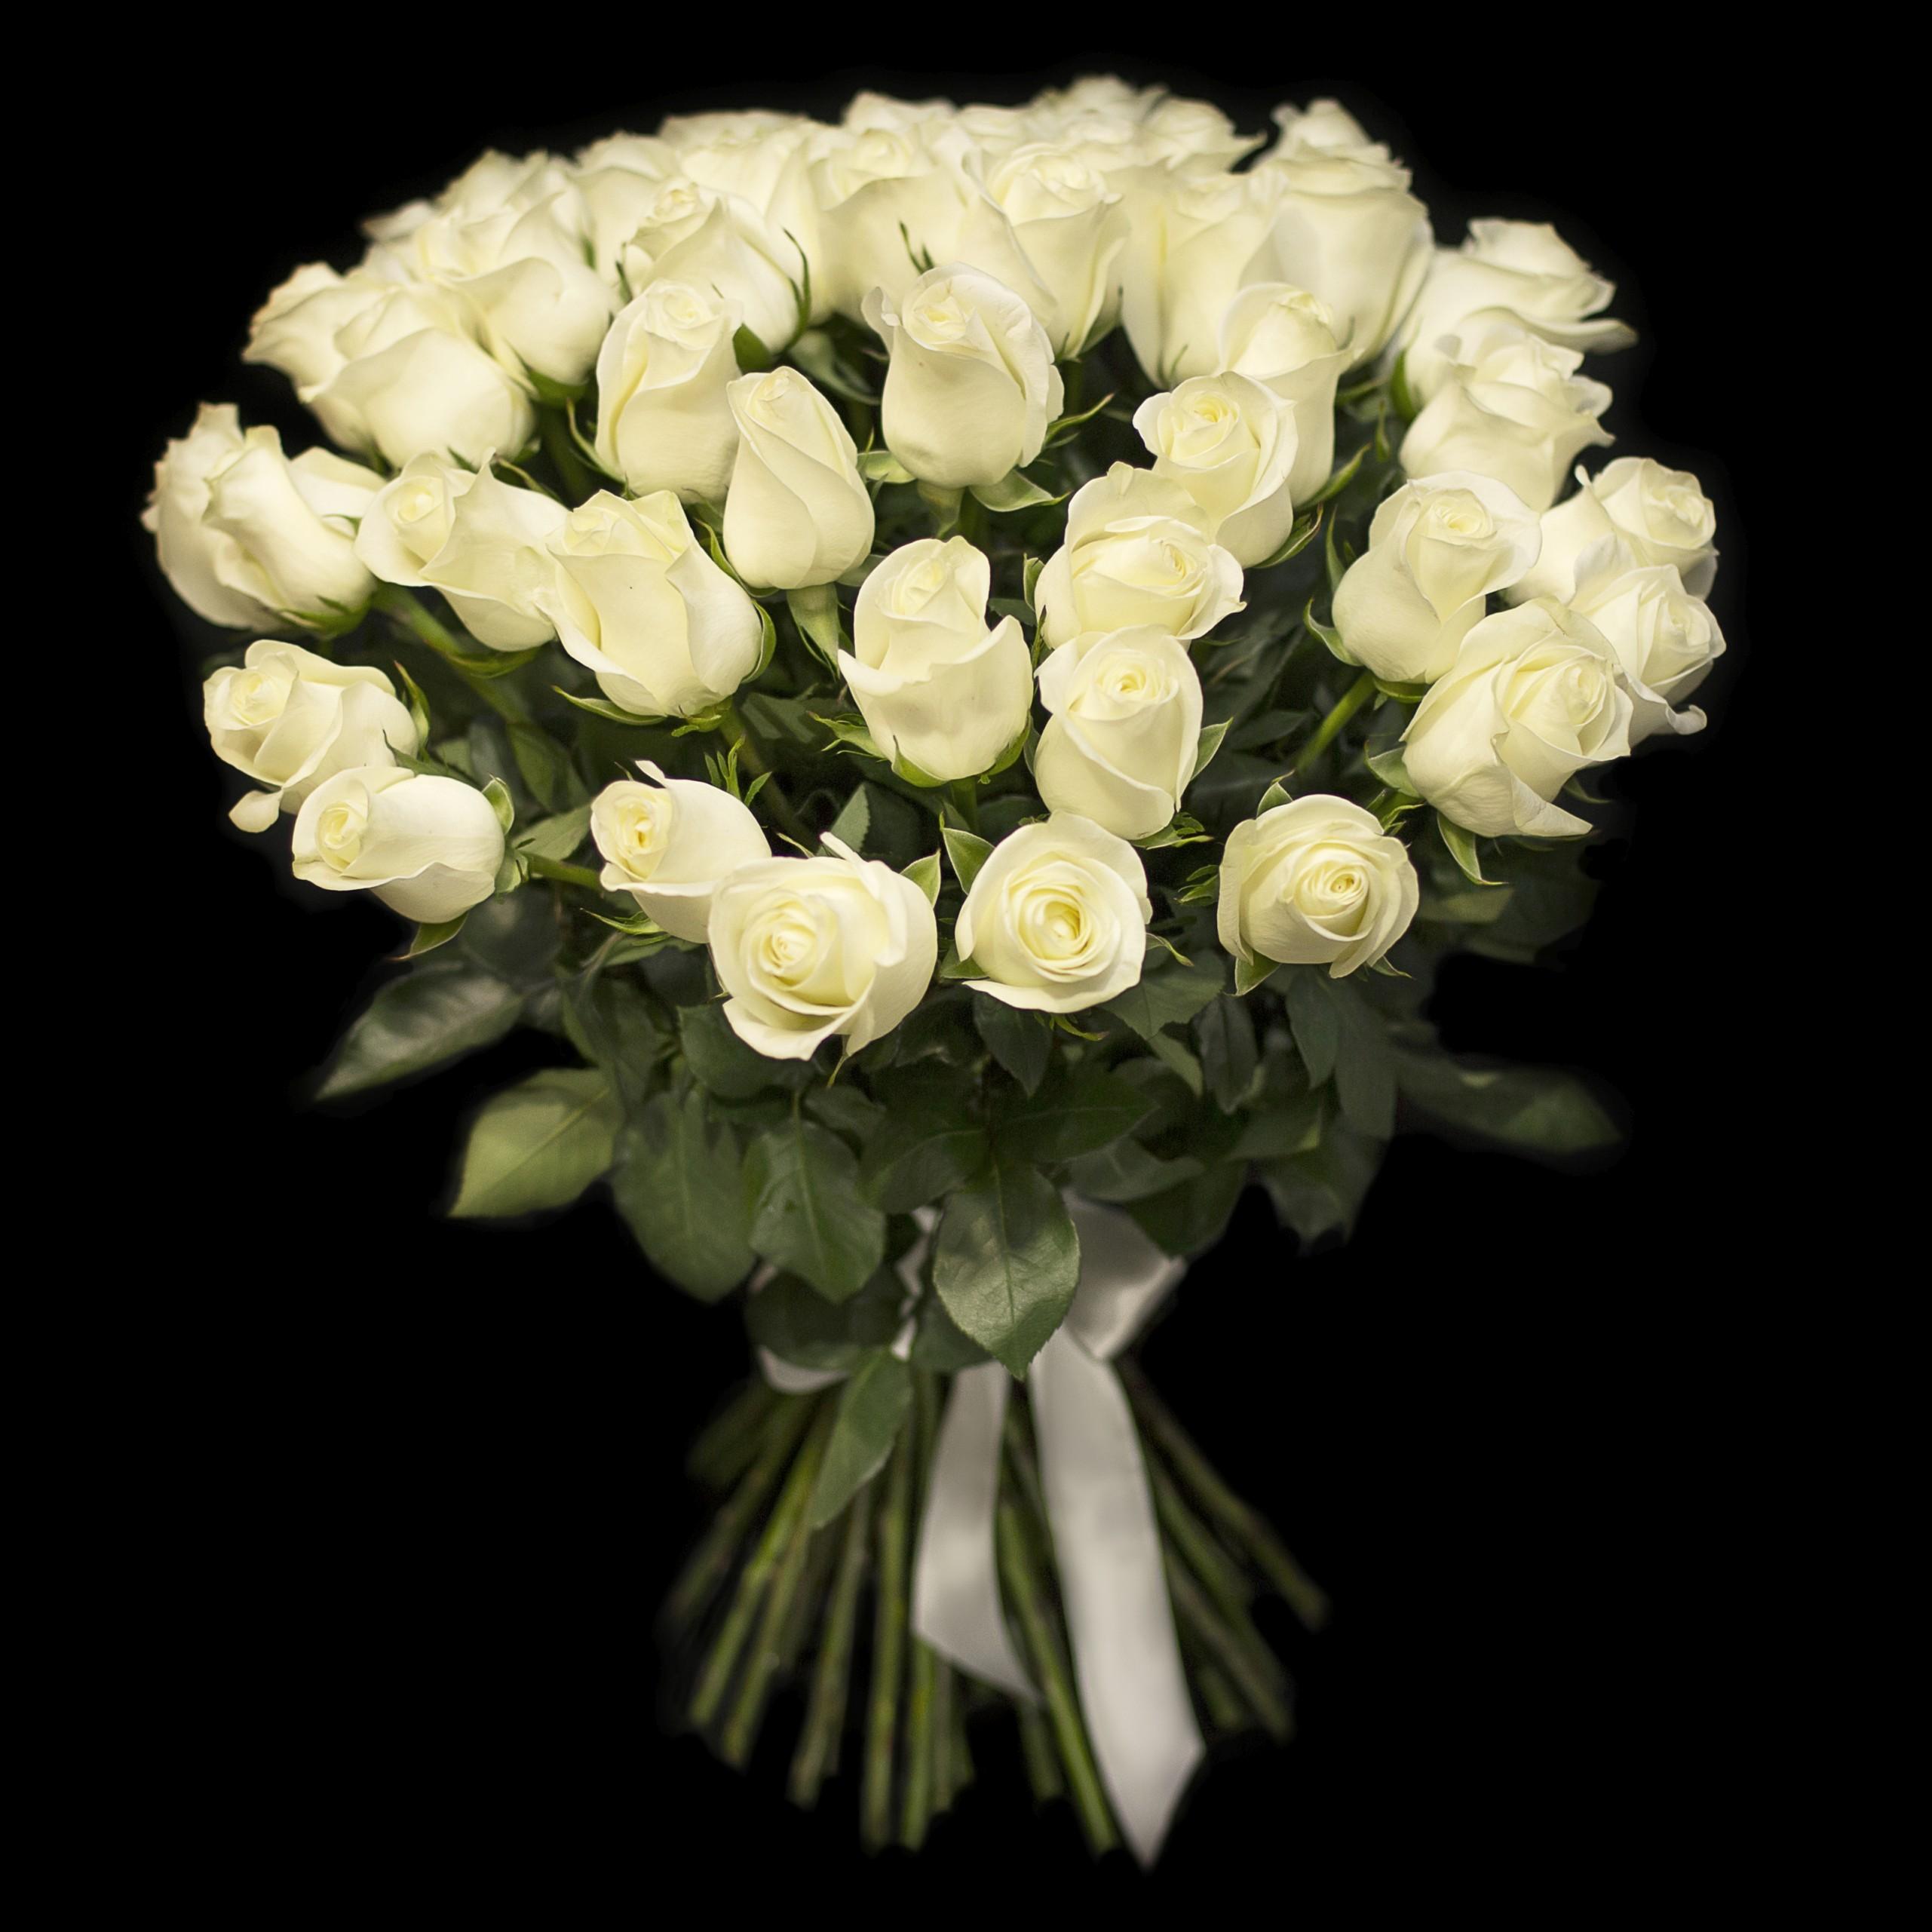 Картинки белых роз букет